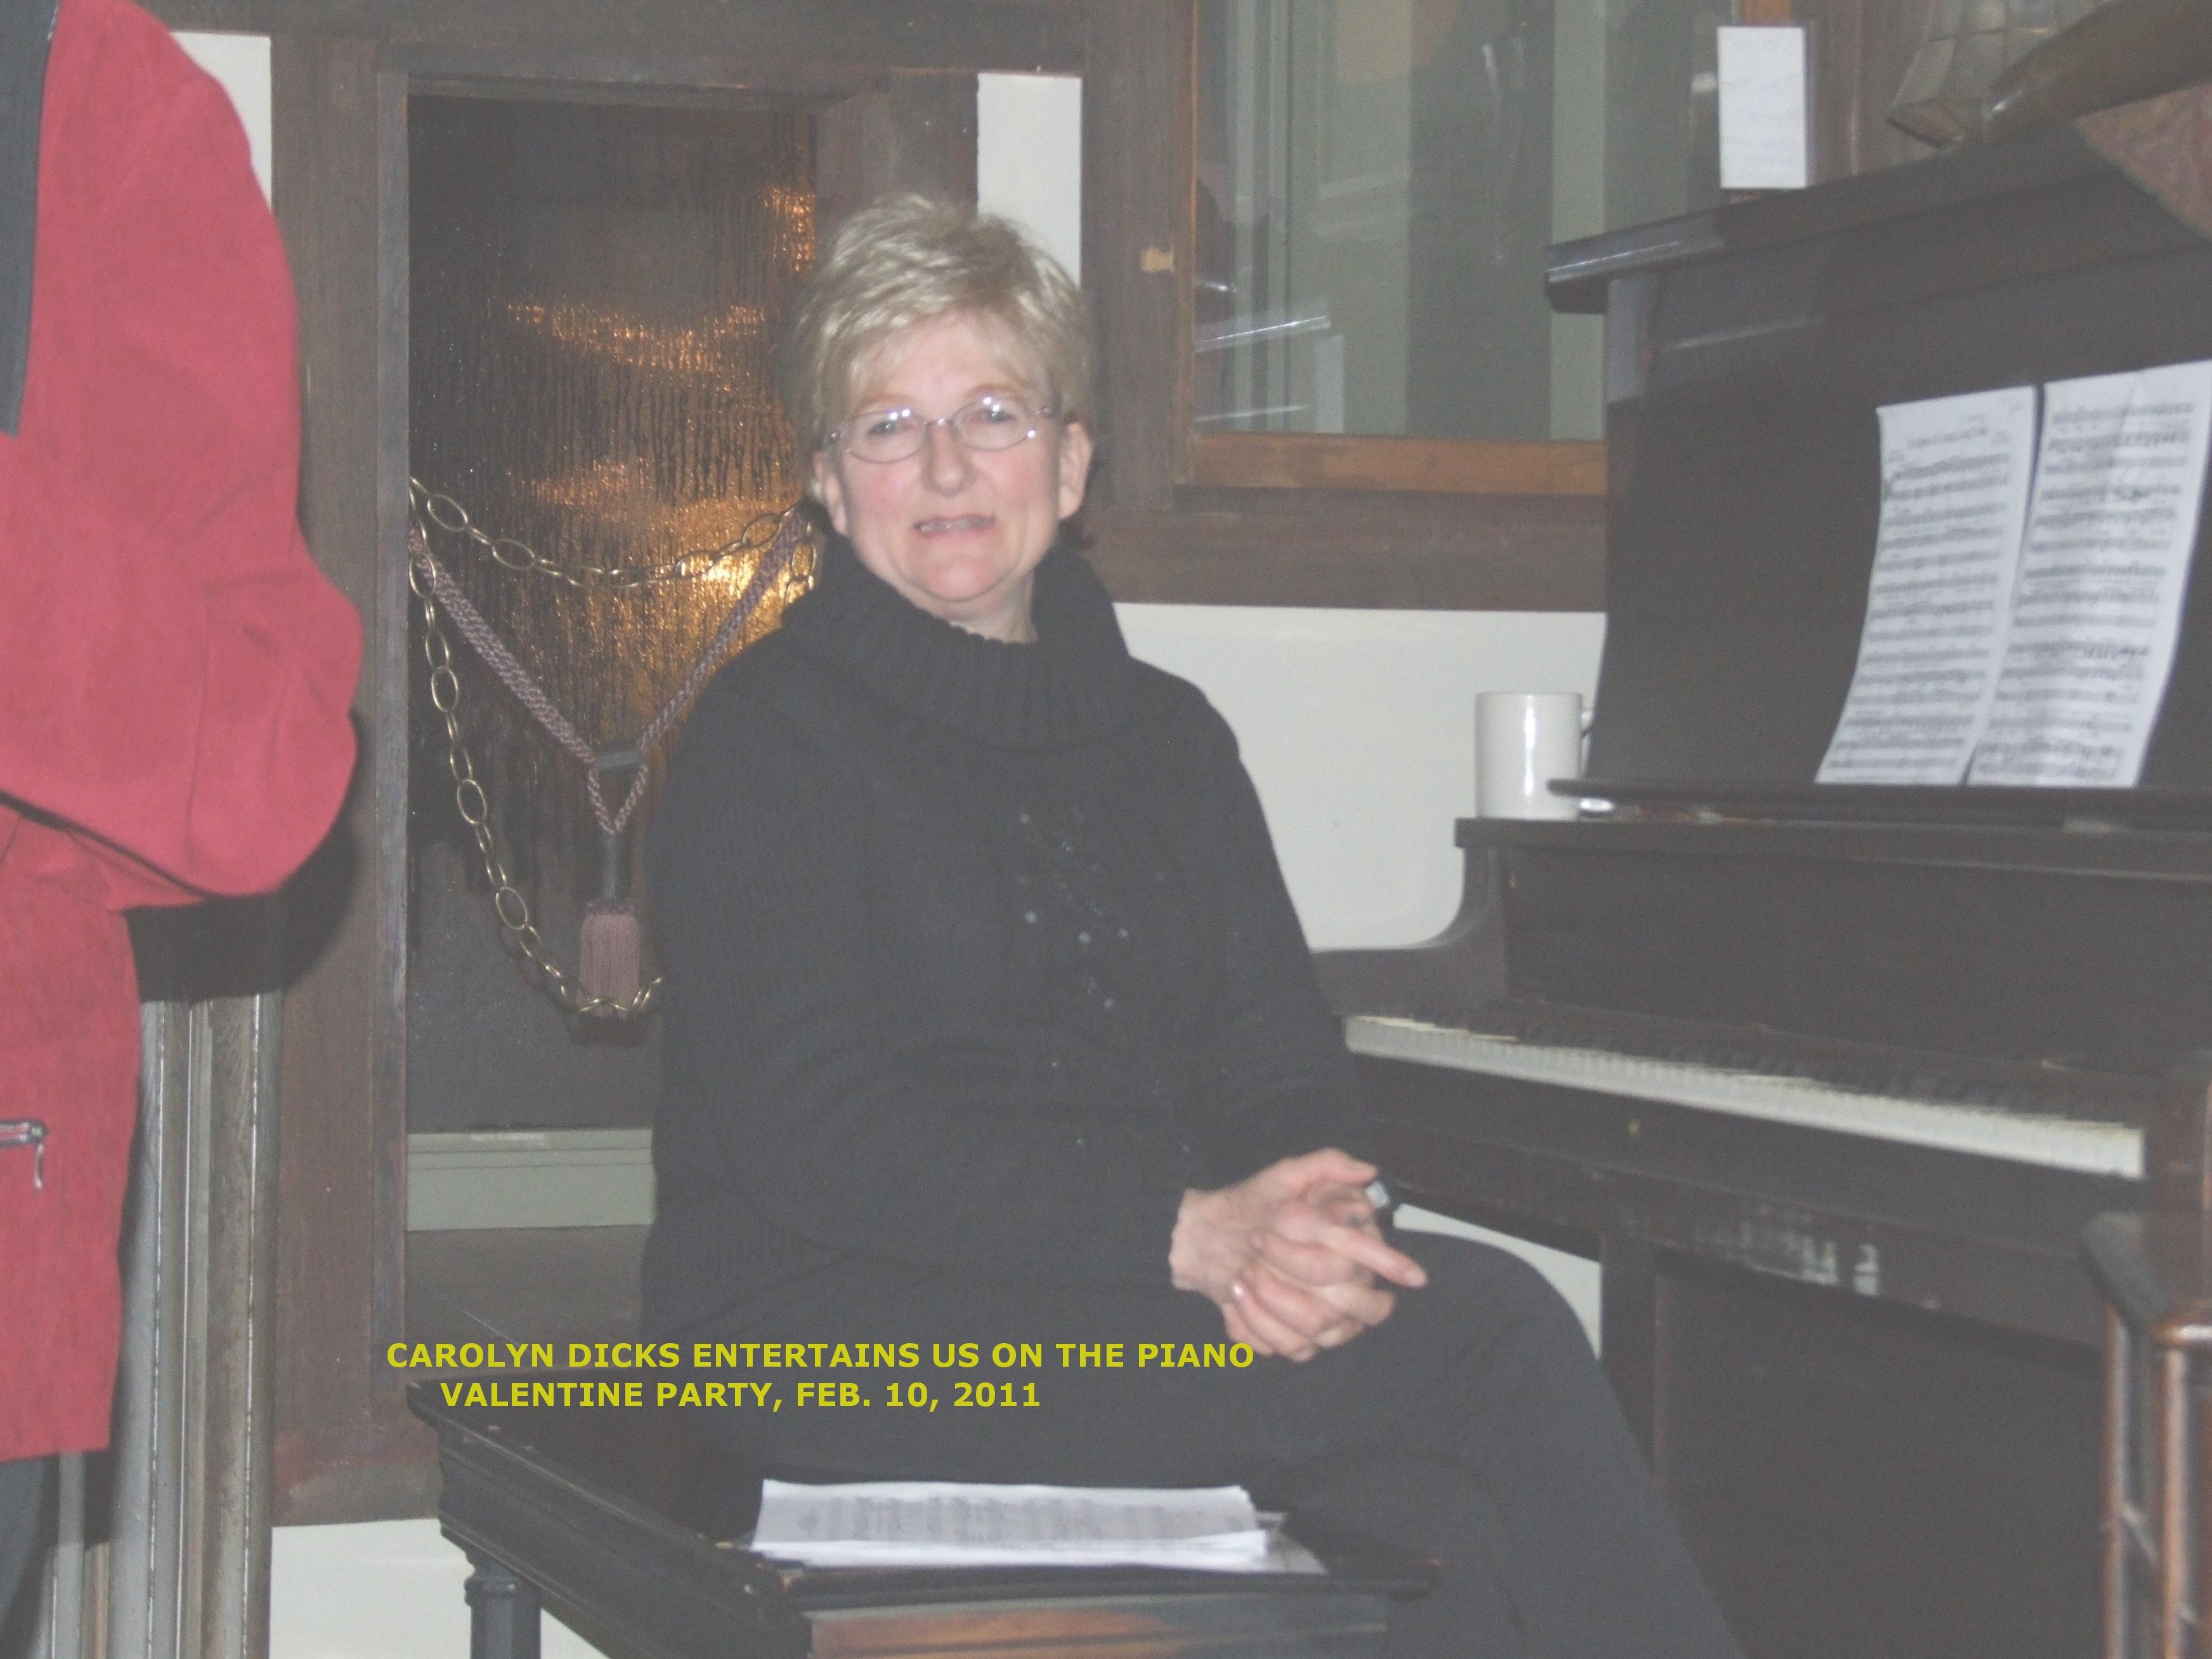 Carolyn Dicks